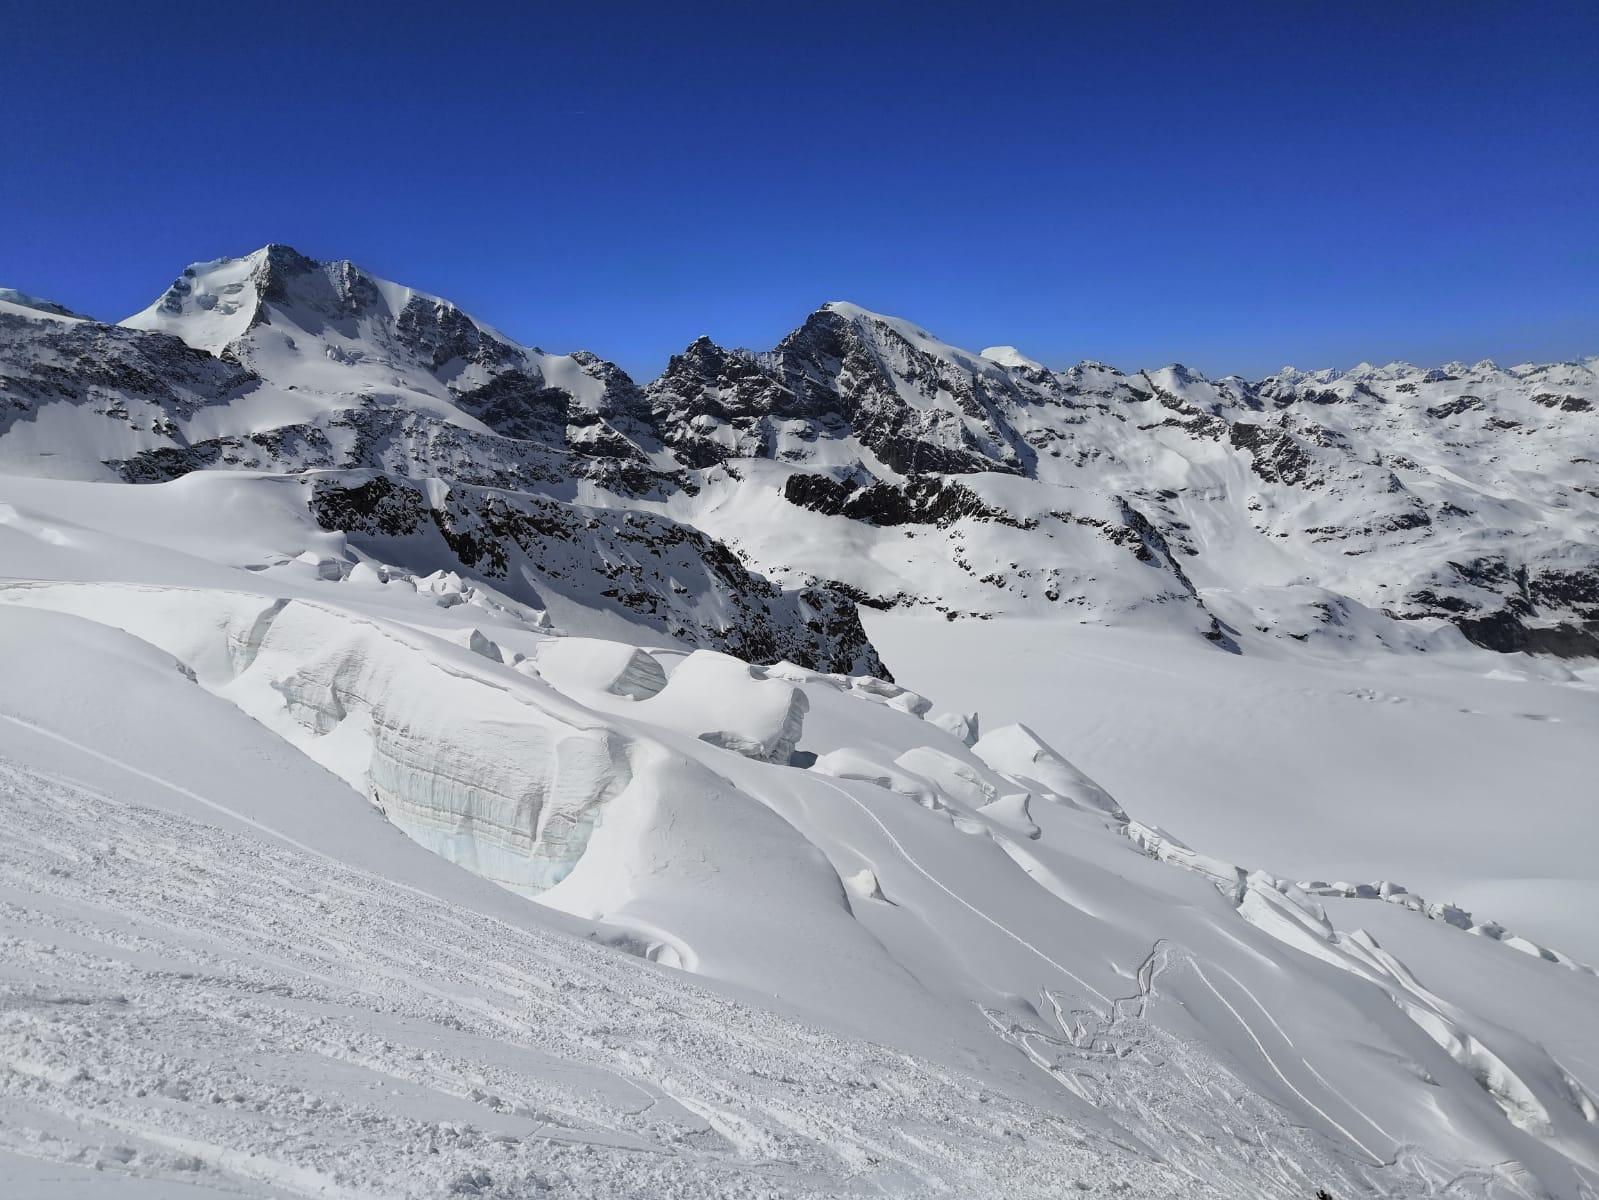 La vista alle nostre spalle, Bernina e Biancograt